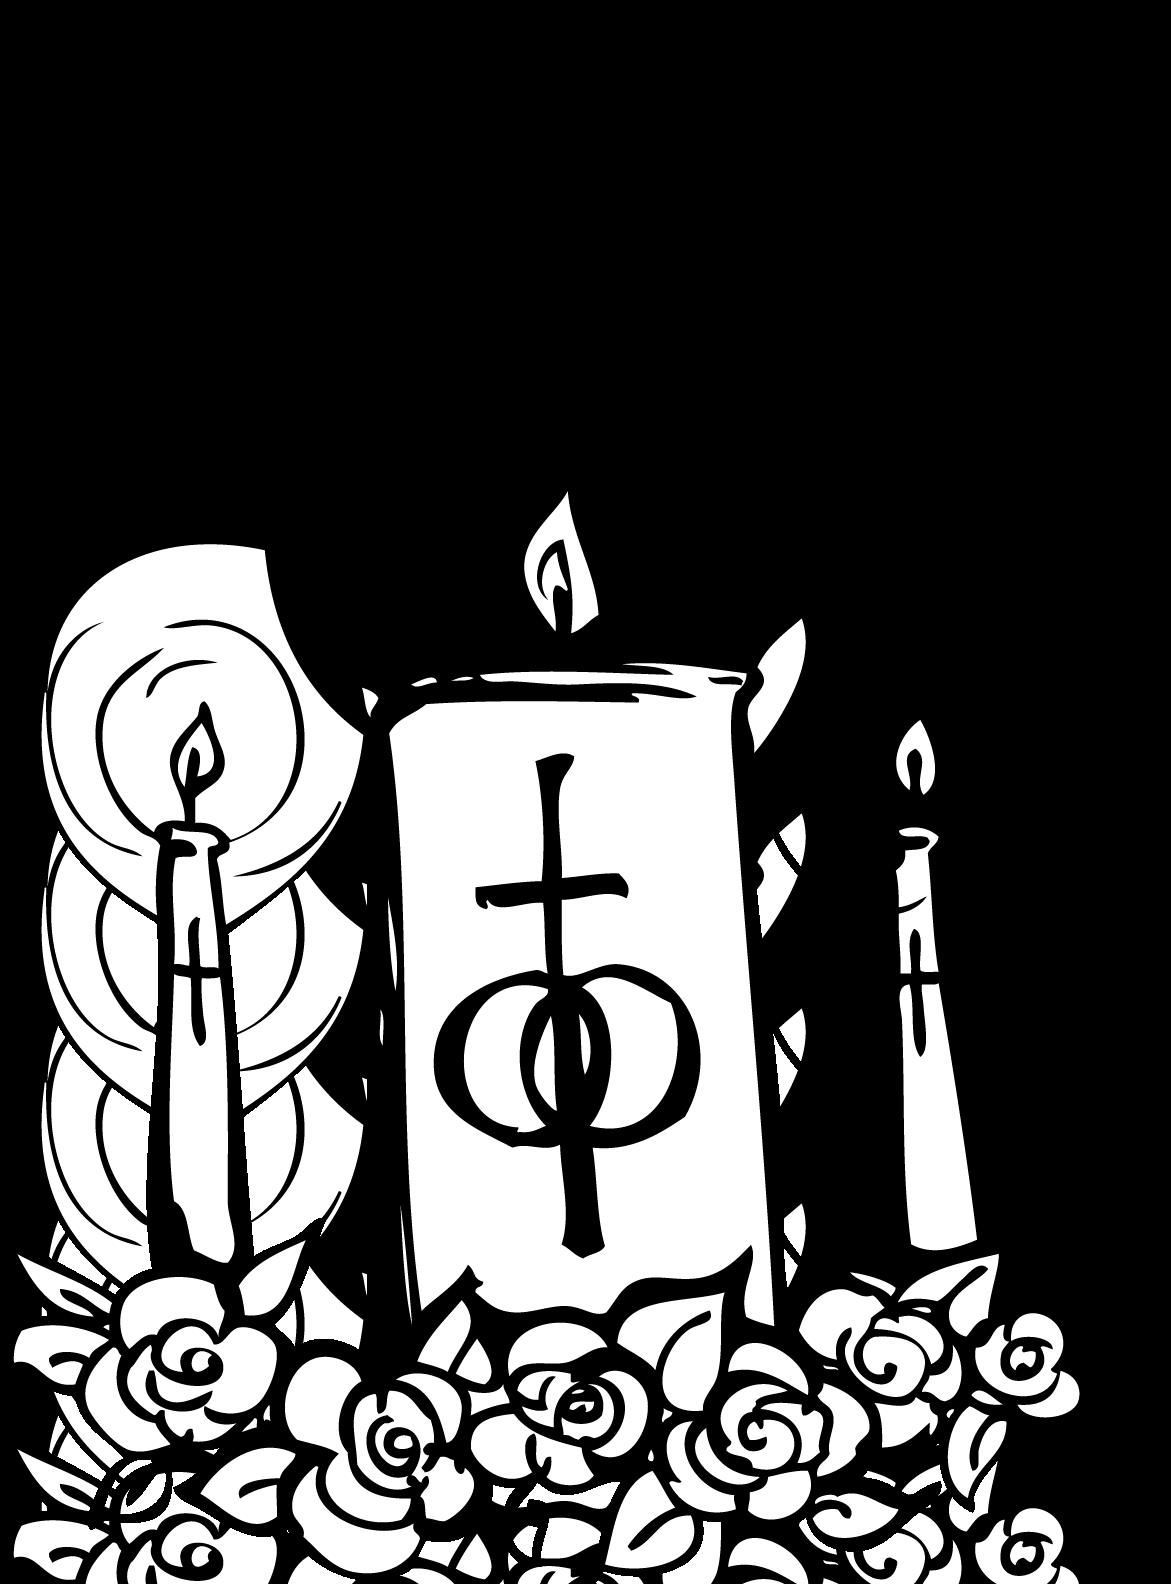 Catholic Church Catholicism Wedding Clip-Catholic Church Catholicism Wedding Clip art - Church Candles-19